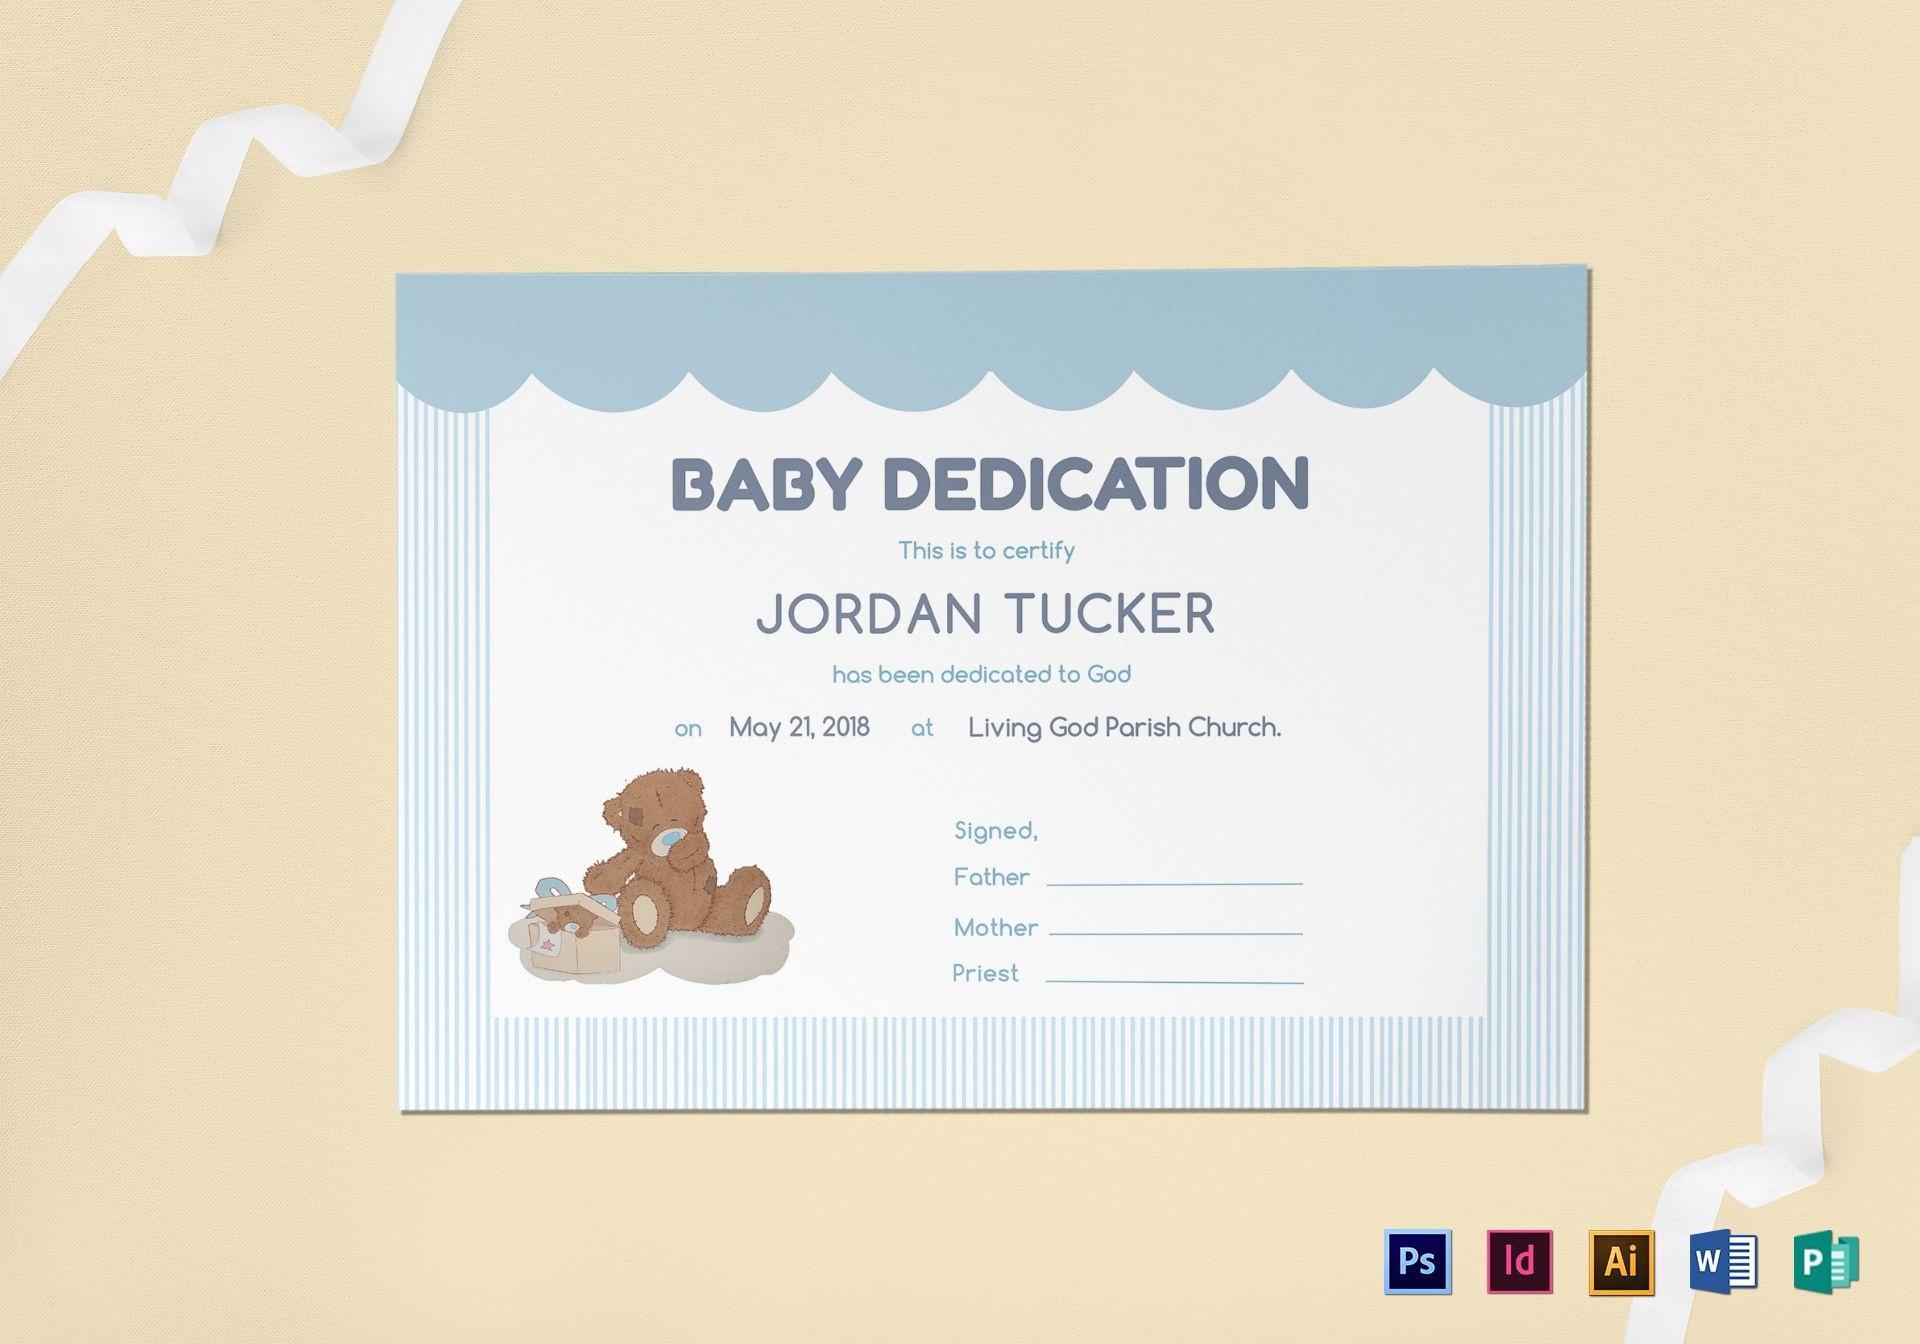 Baby Dedication Certificate Design Template In Psd, Word, Publisher - Free Baby Dedication Certificate Printable